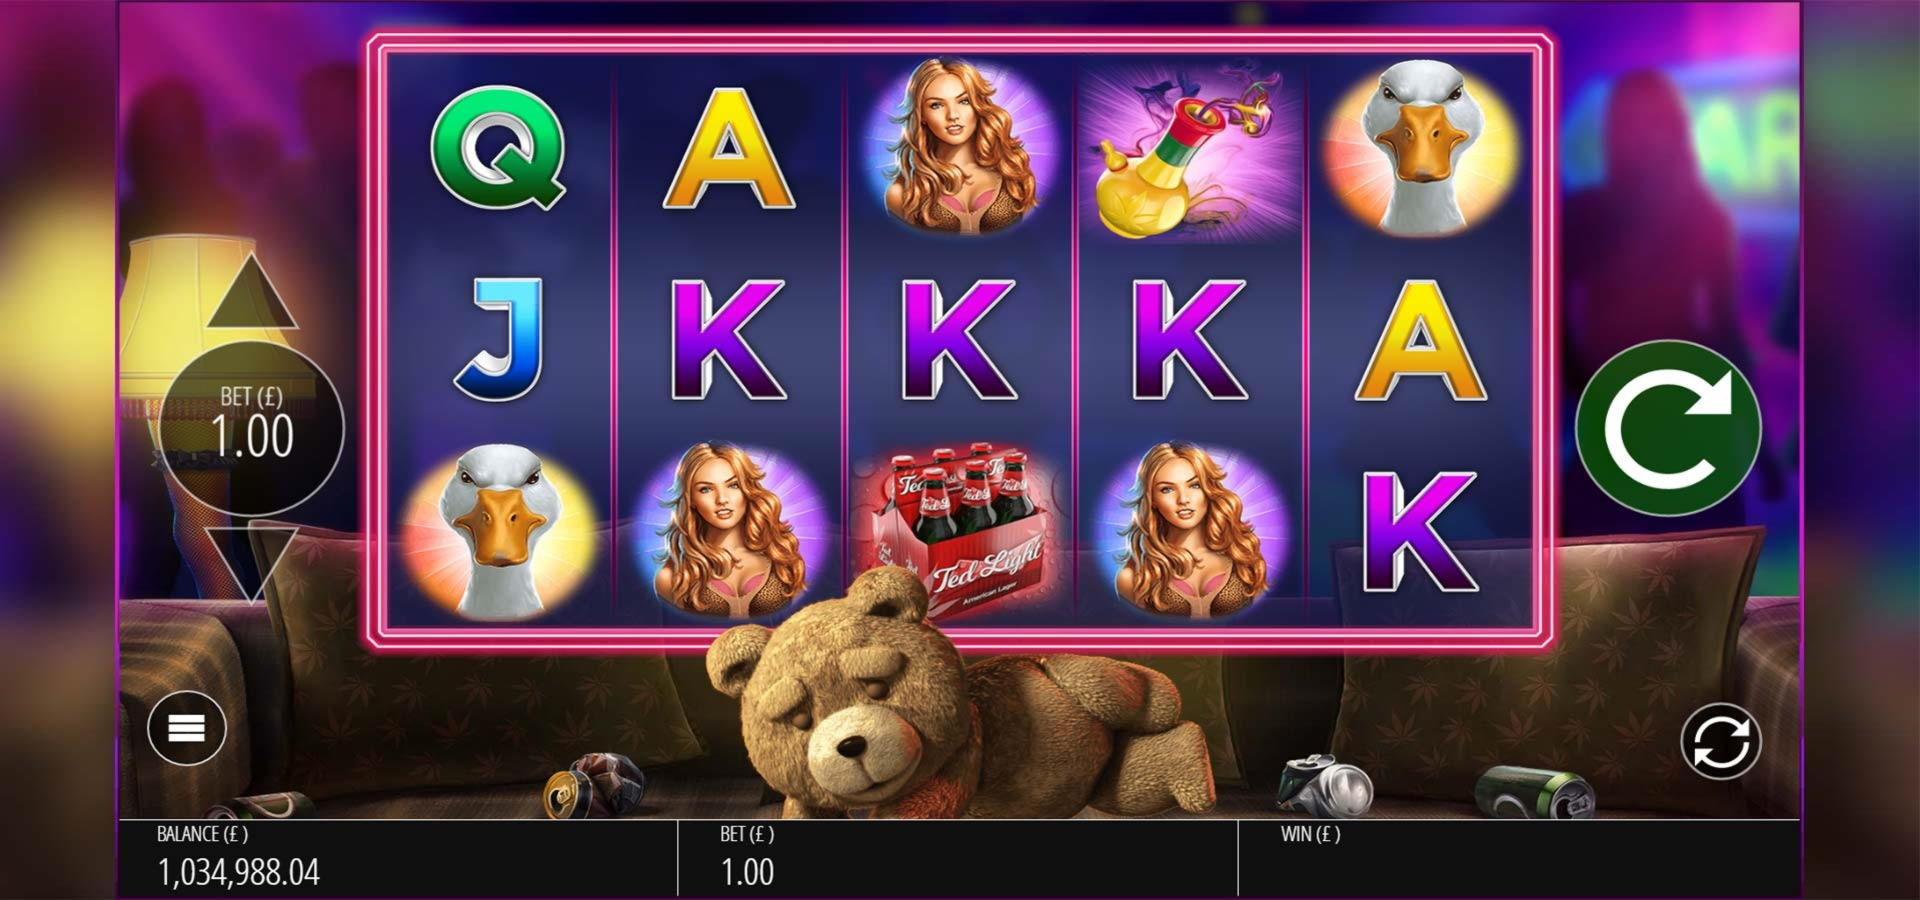 275 Free spins no deposit casino at Xtip Casino